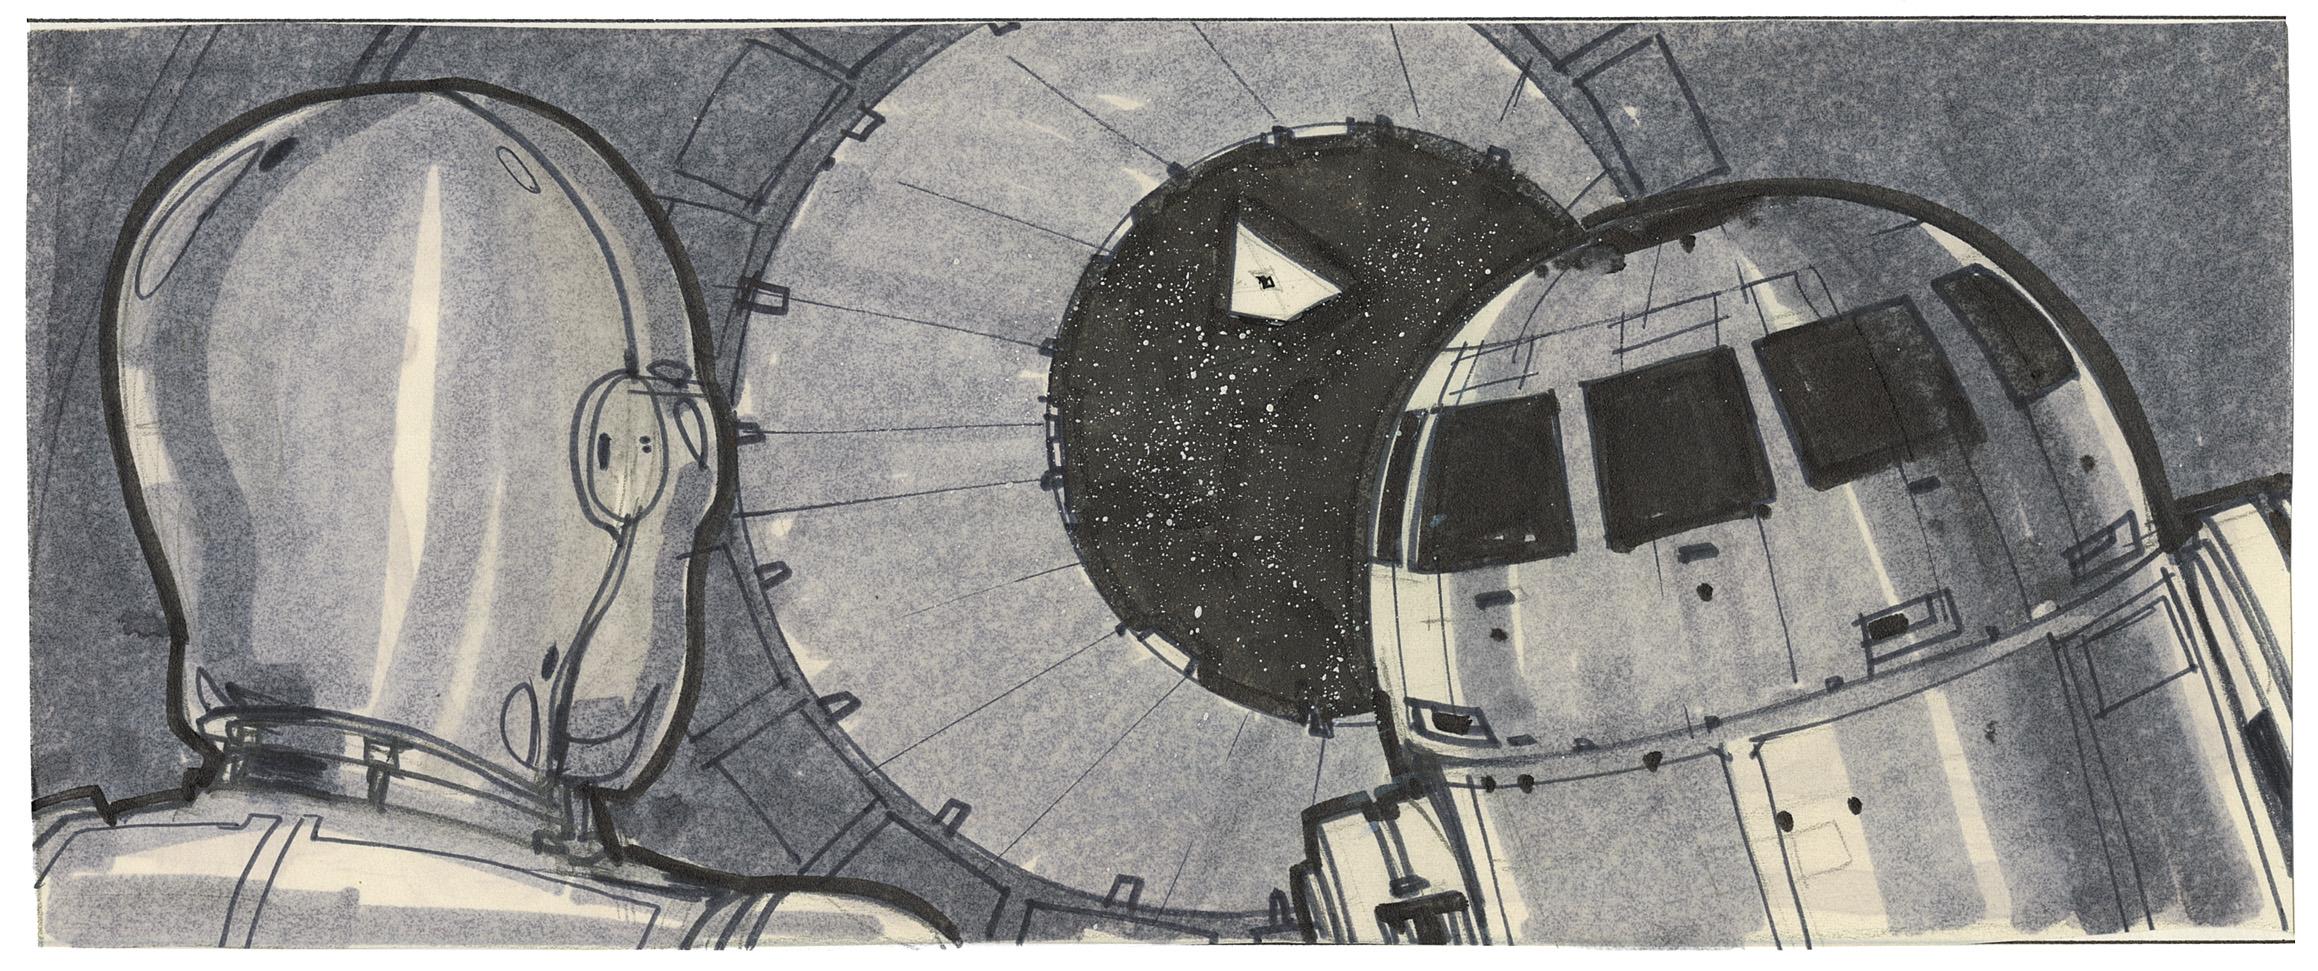 star-wars-storyboard01